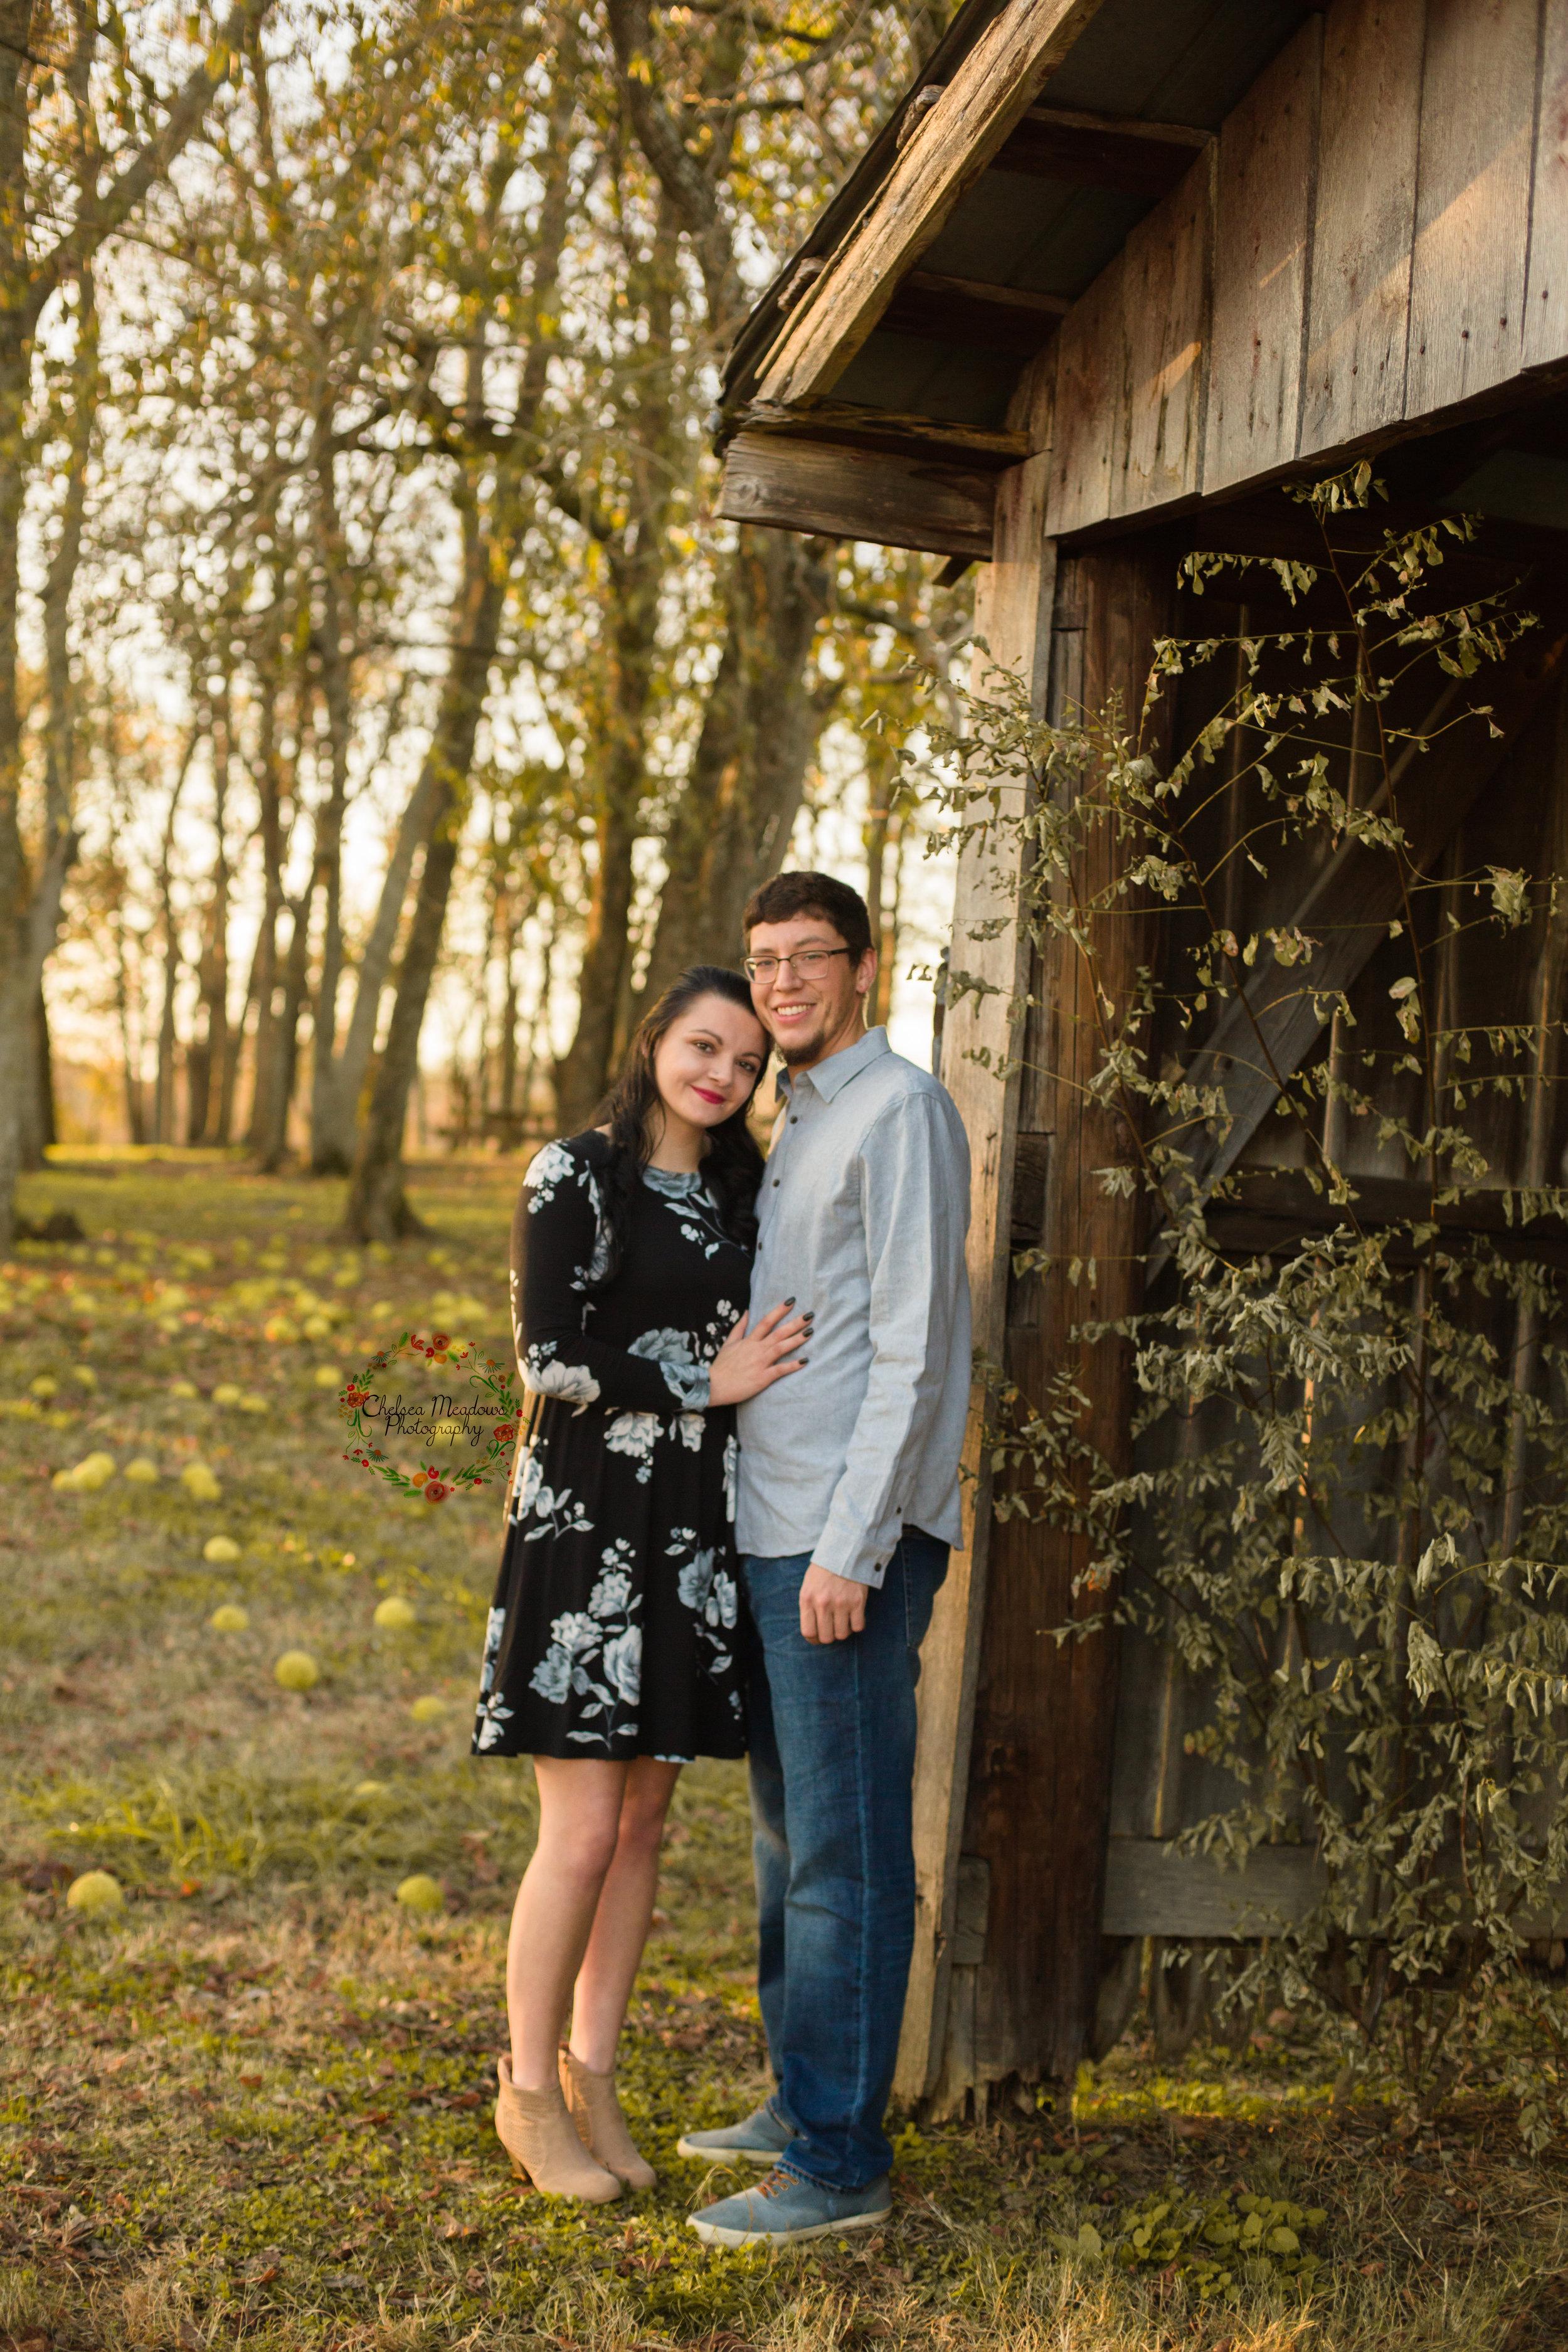 Jessica & Derek Engagement - Nashville Wedding Photographer - Chelsea Meadows Photography (43).jpg